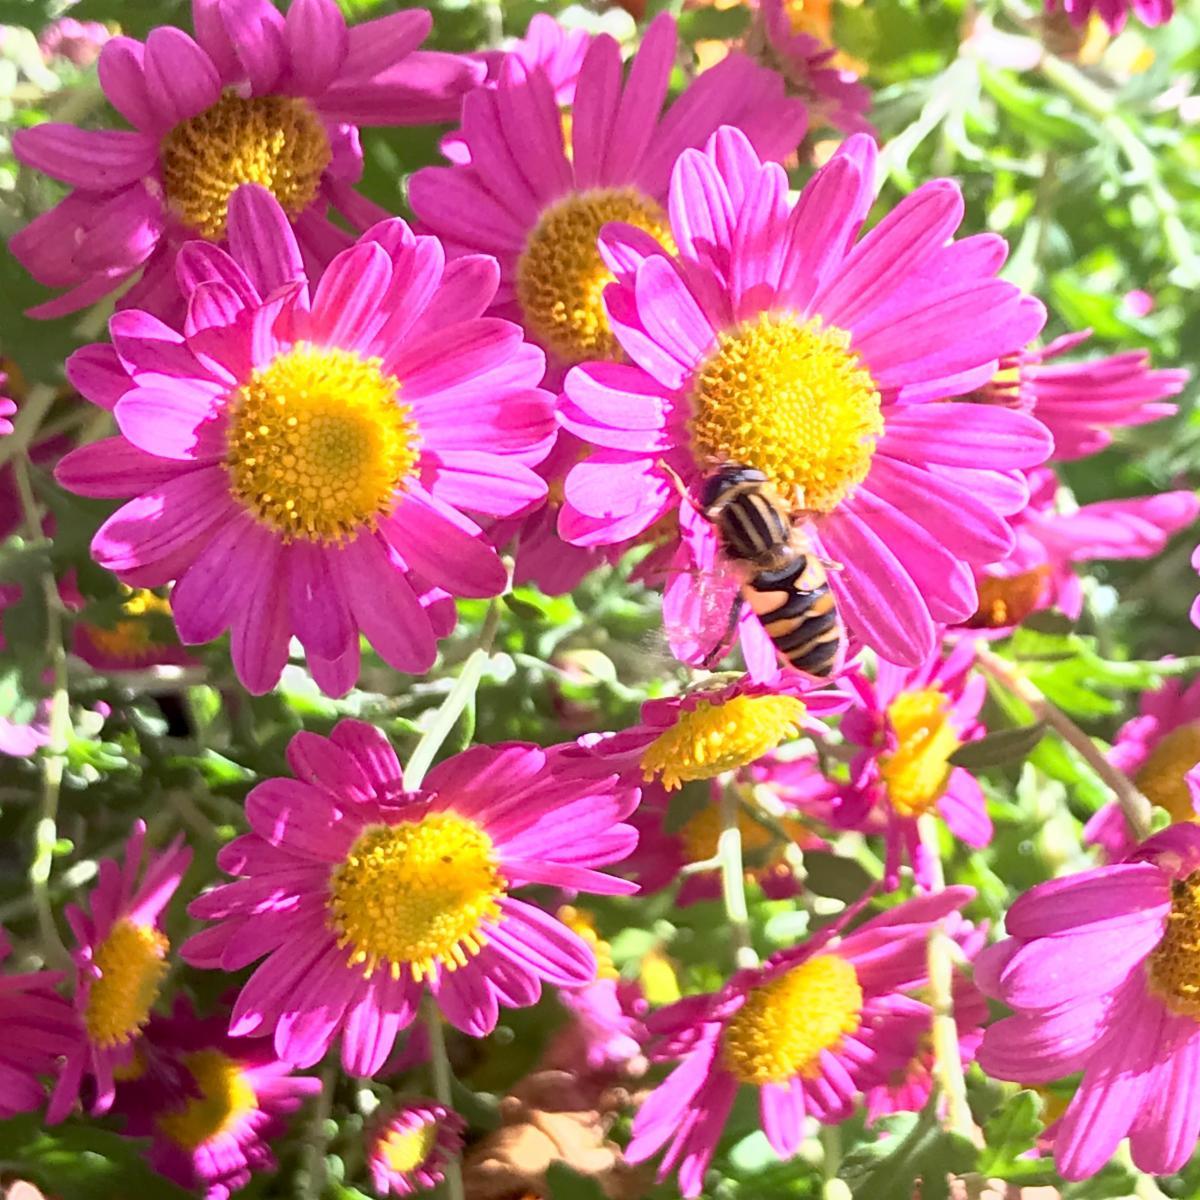 Aster or chrysanthemum